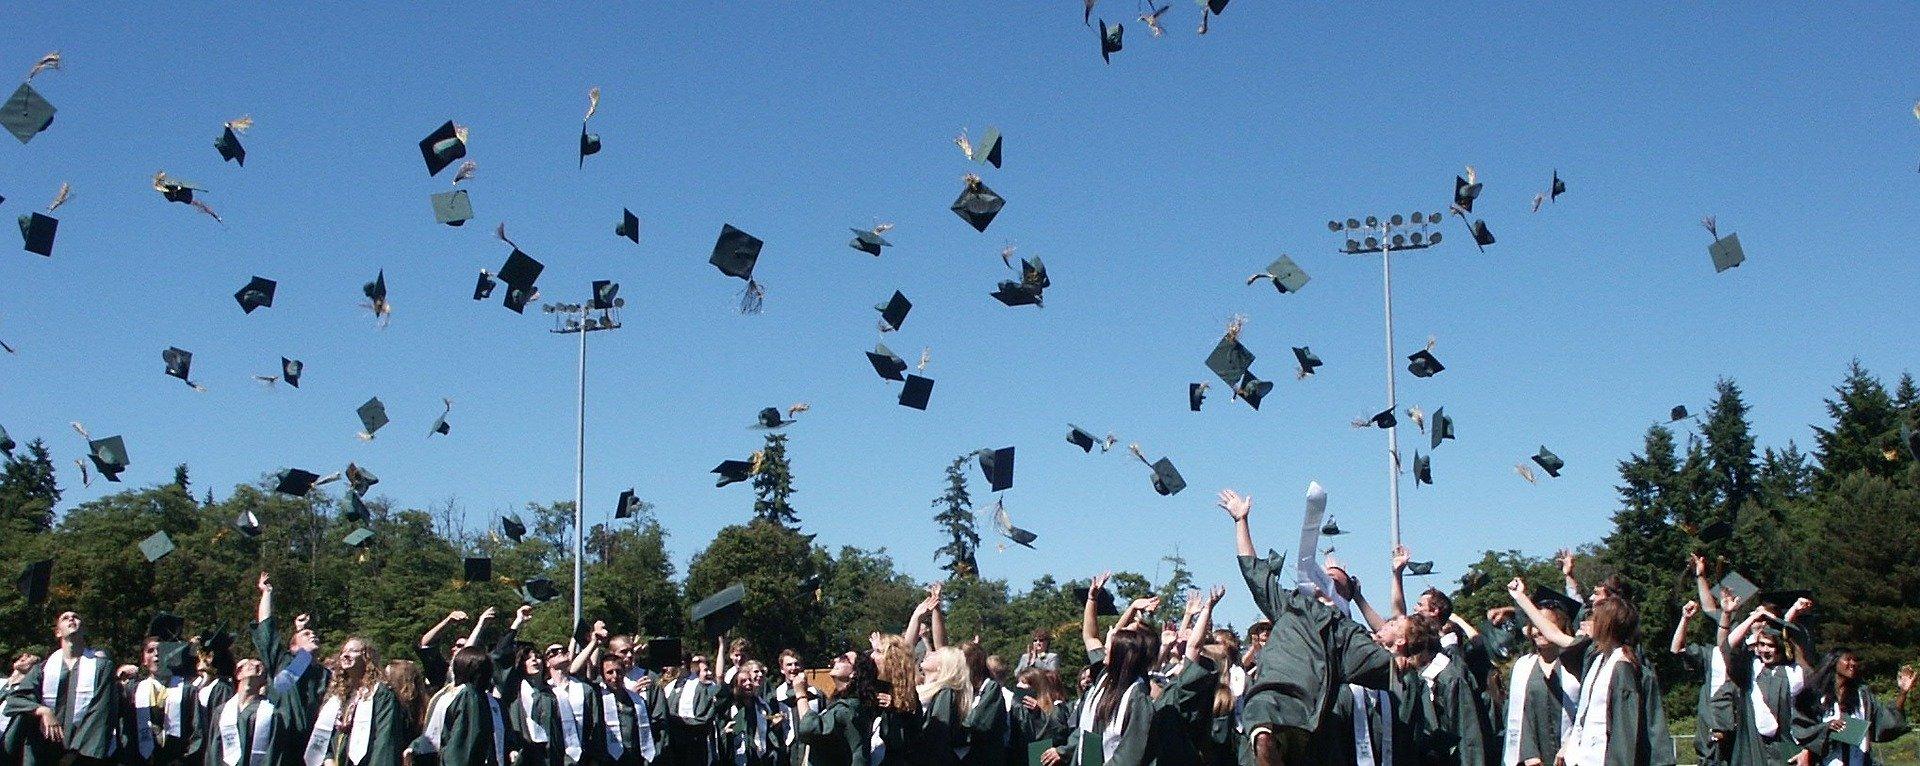 prosperbull financial literacy for high schools